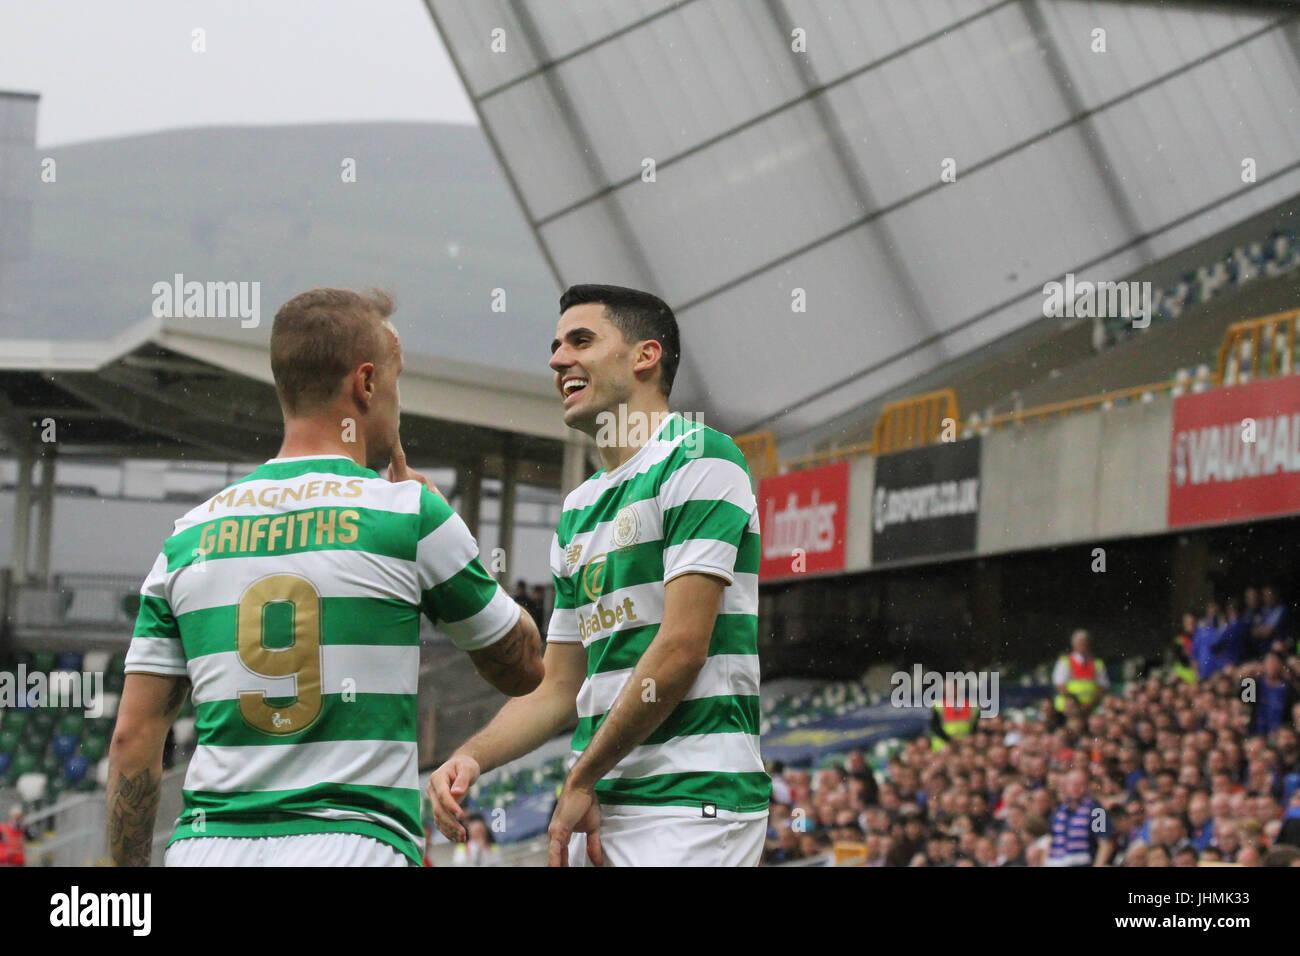 Windsor Park, Belfast, UK. 14 July 2017. Linfield v Celtic (UEFA CL QR2 1st Leg). Celtic's Tom Rogic (right) - Stock Image